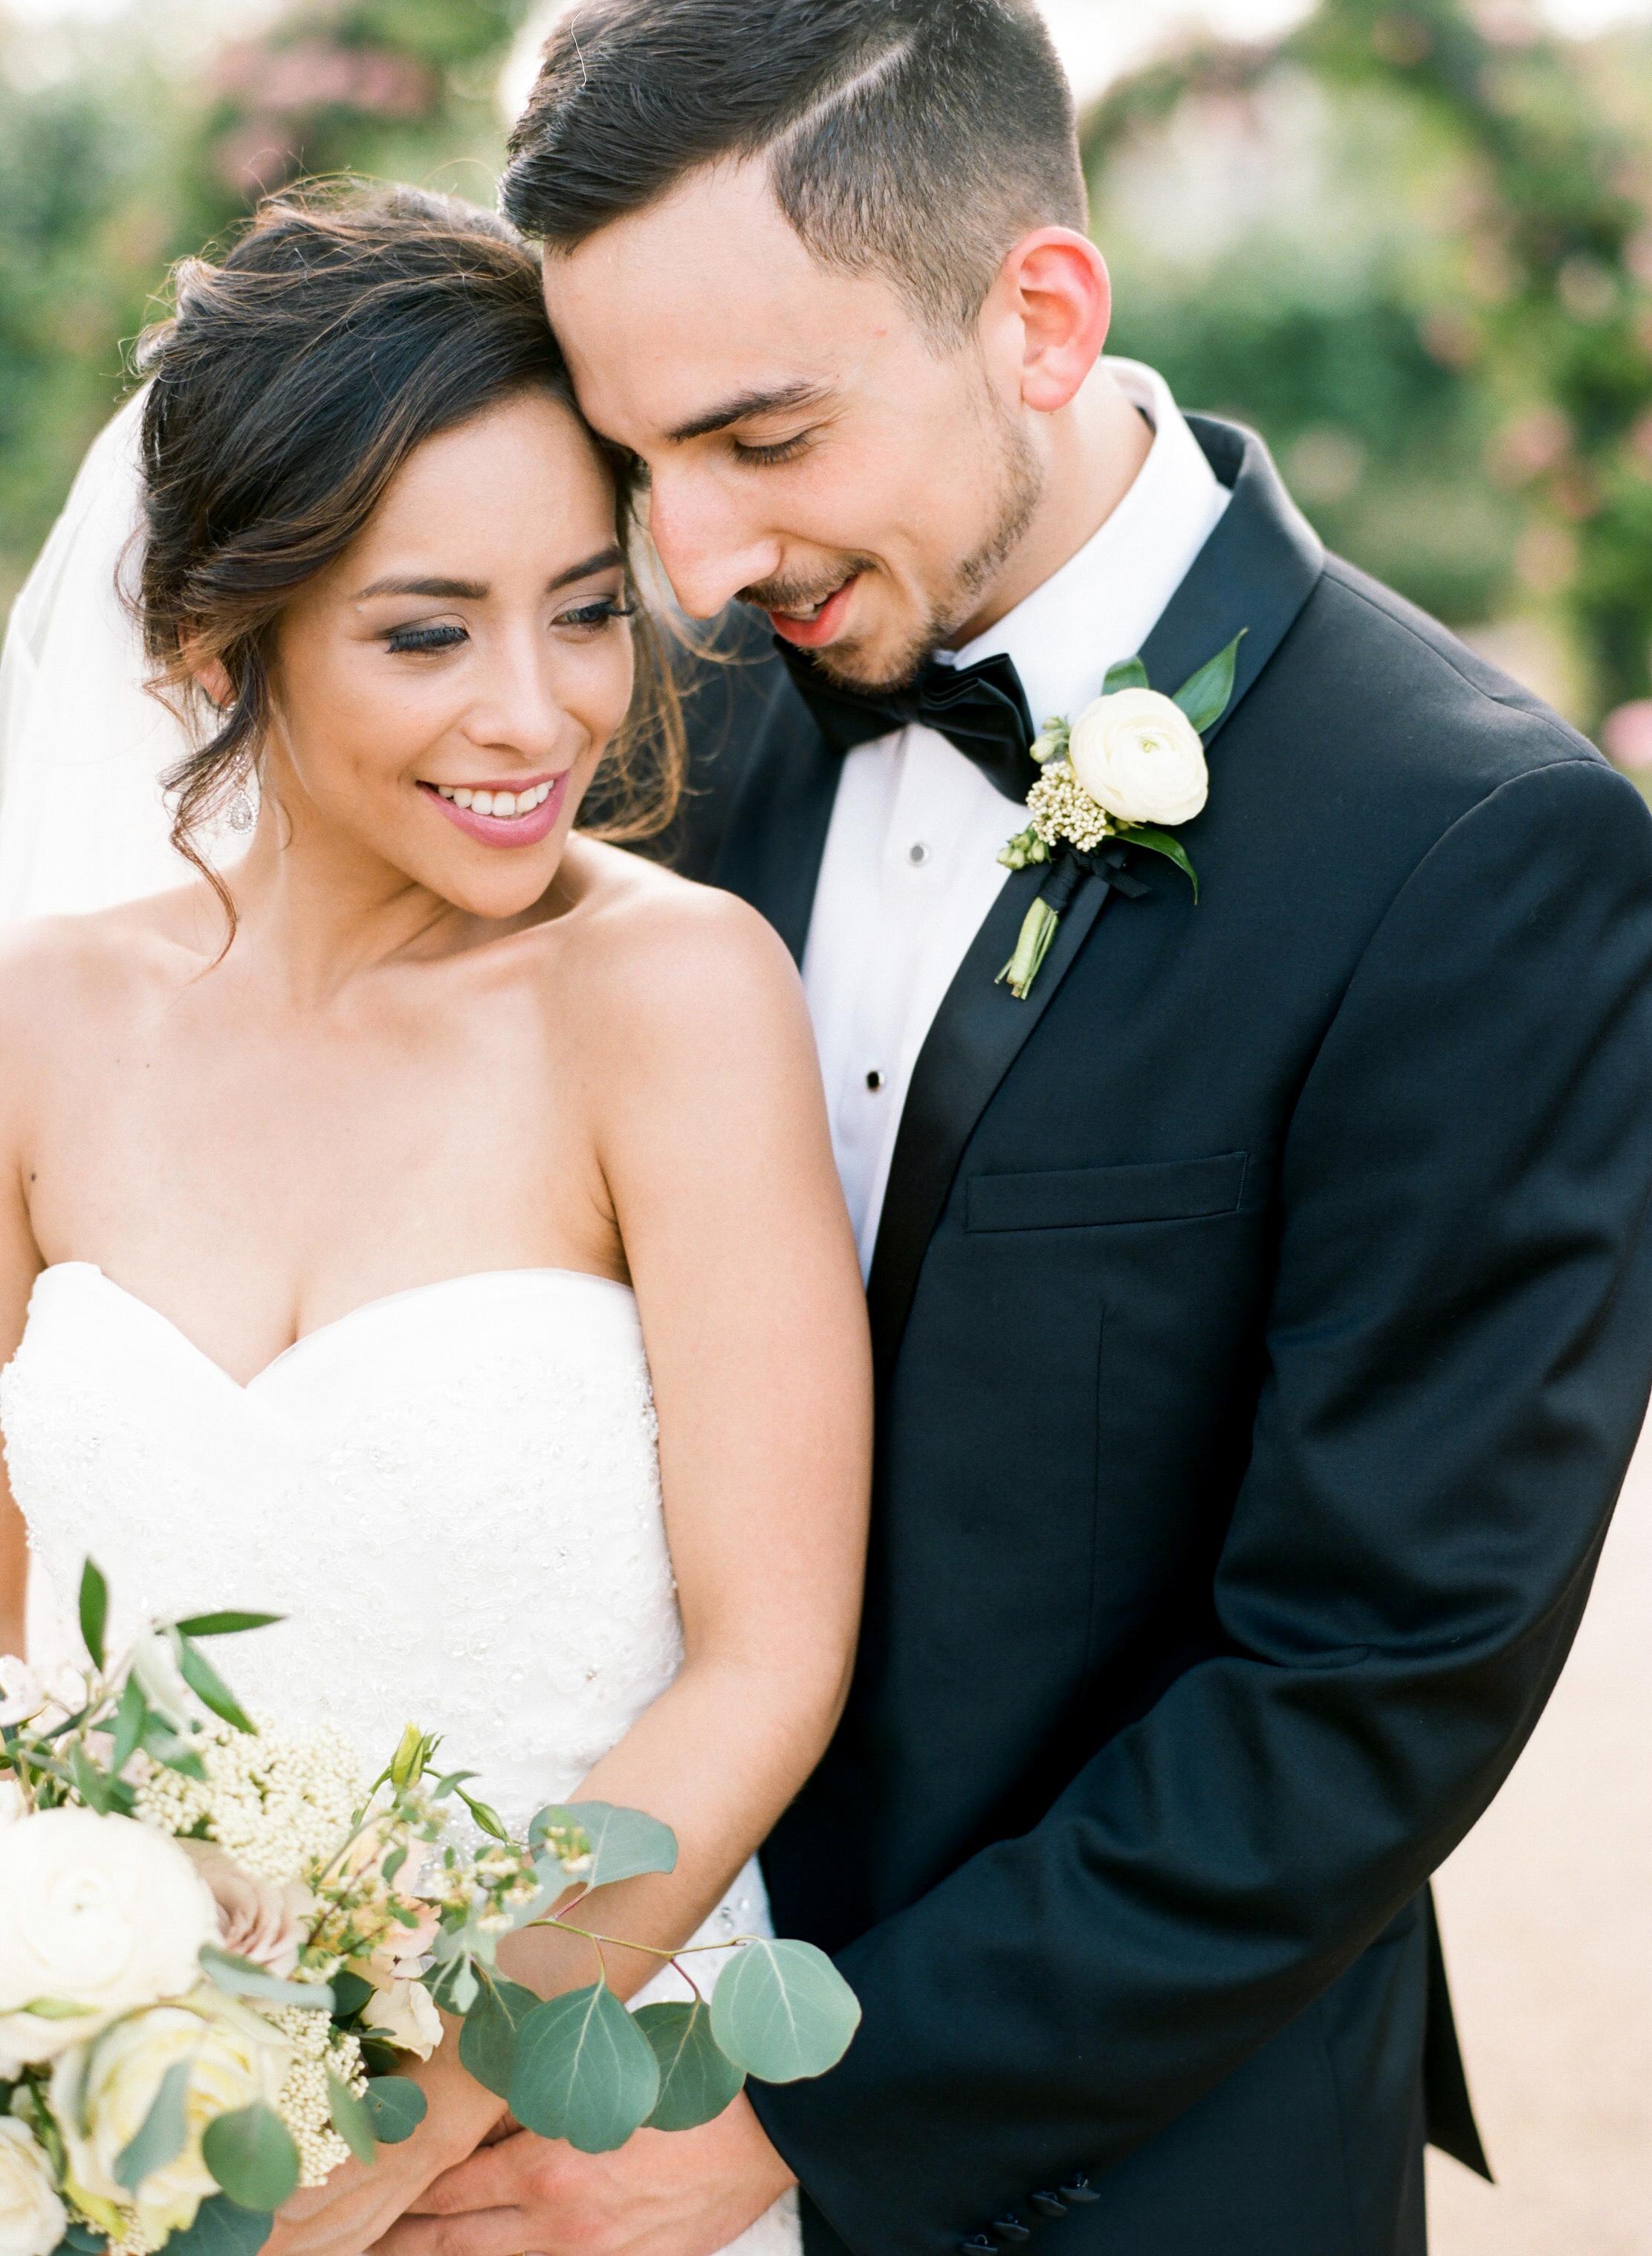 Houston-Wedding-Photography-St.-Anne-Catholic-Church-Houston-Wedding-The-Bell-Tower-on-34th-reception-wedding-film-25.jpg